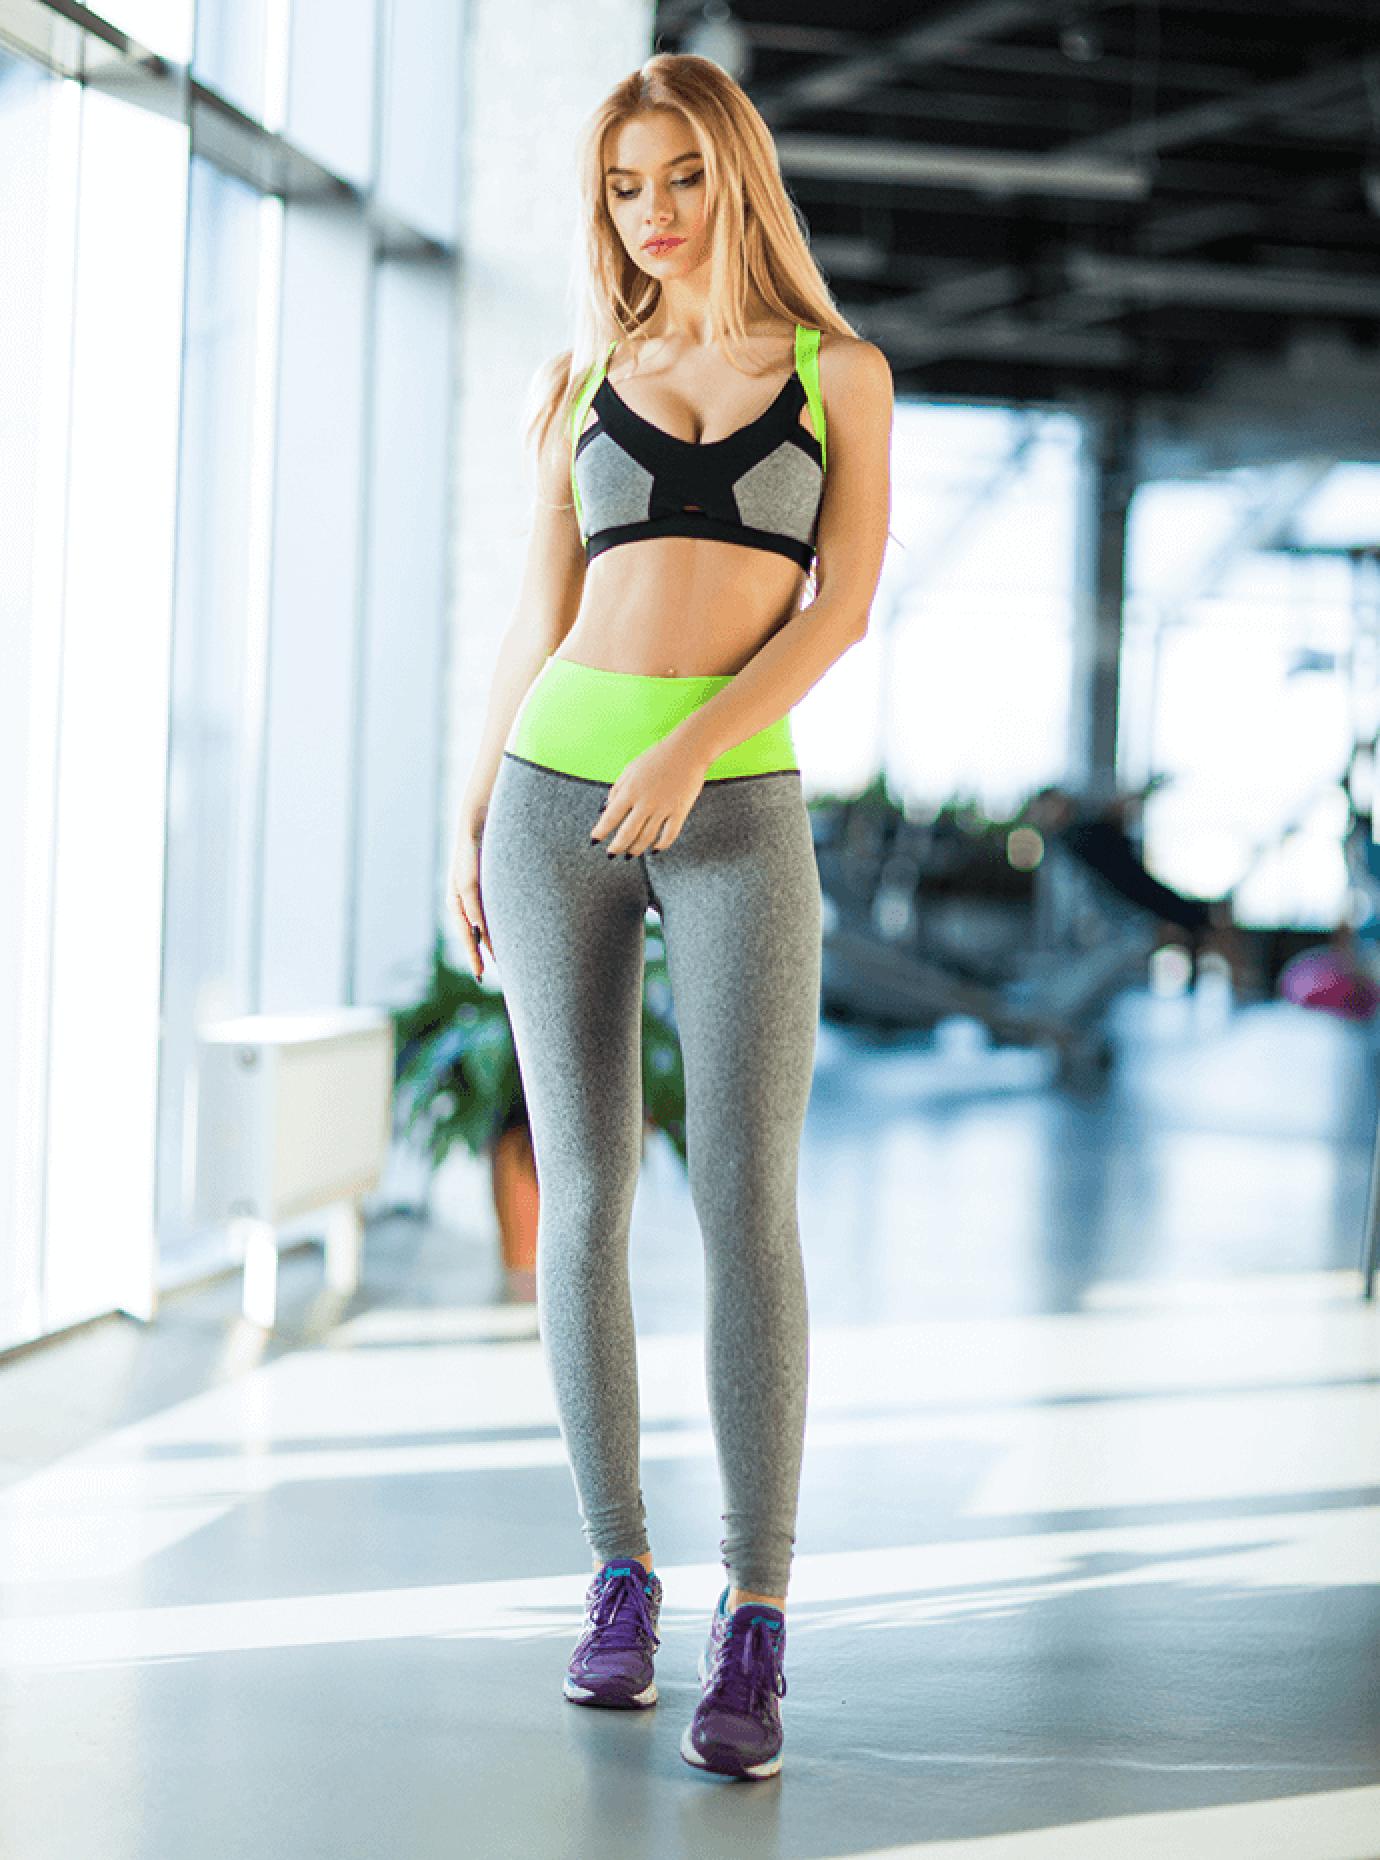 Комплект женский Pro Jersey Green Серый S (01-F171134): фото - Alster.ua